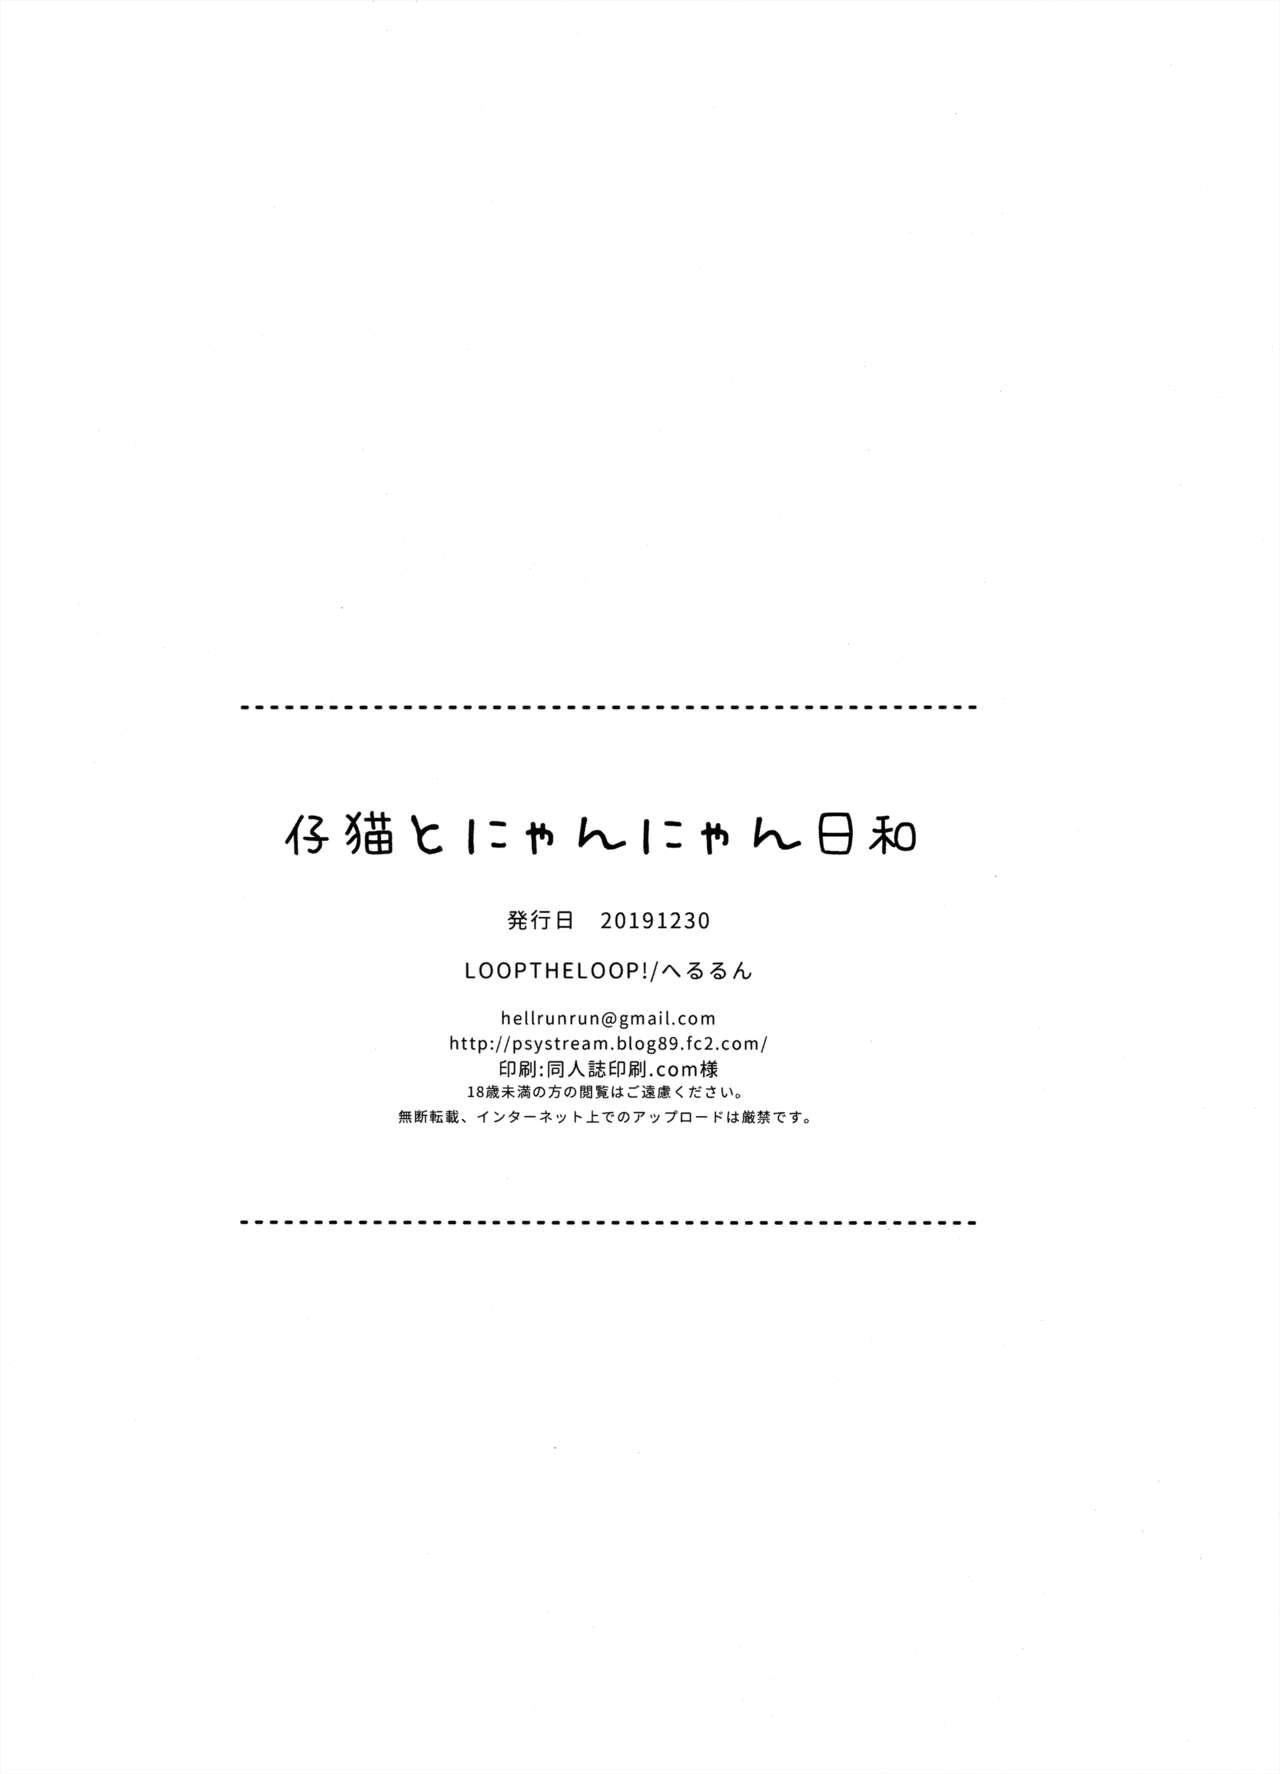 Koneko to Nyan Nyan Biyori 16